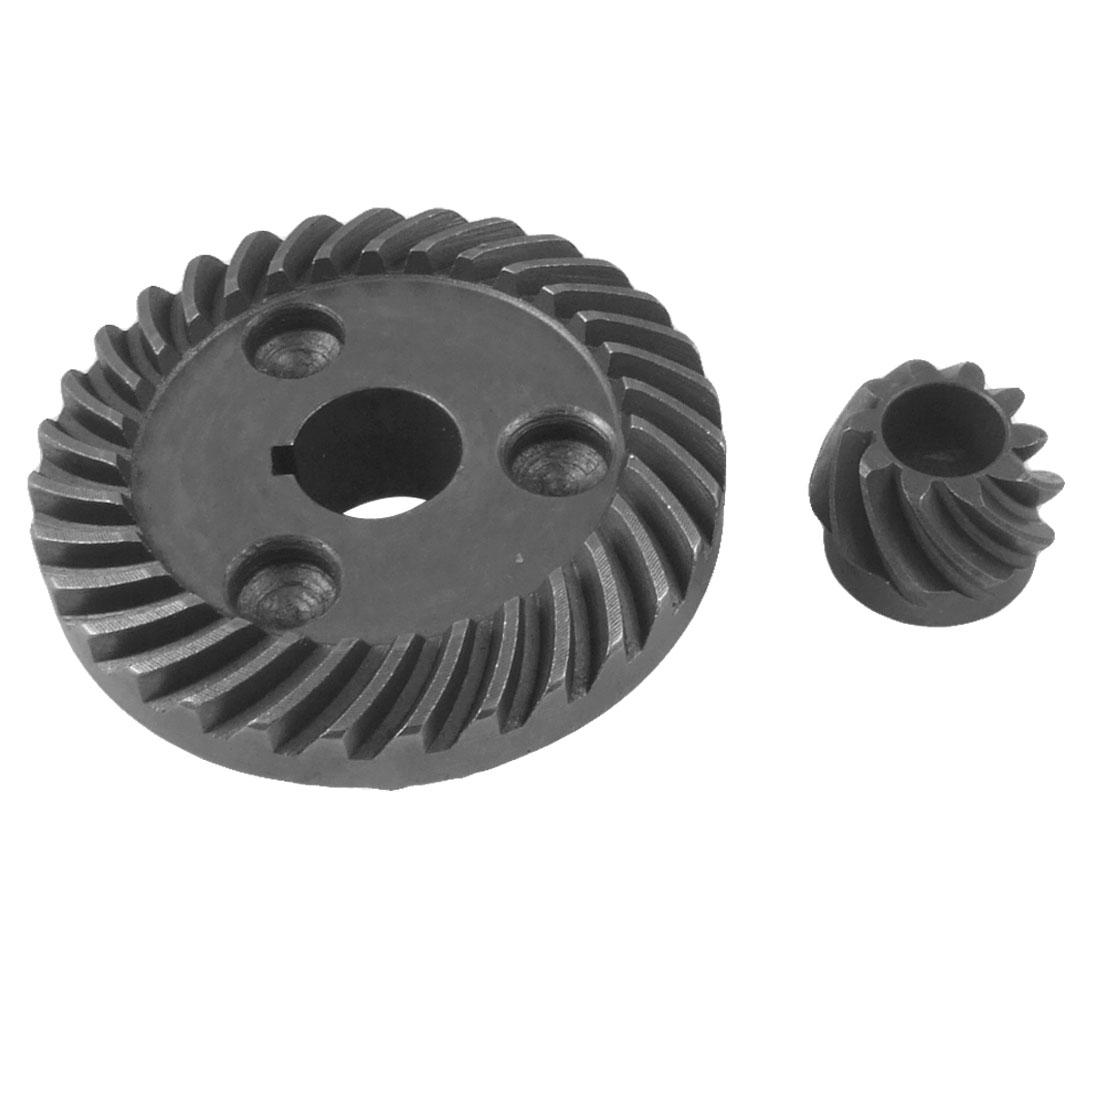 Replacement Part Metal Spiral Bevel Gear 2 Pcs Set